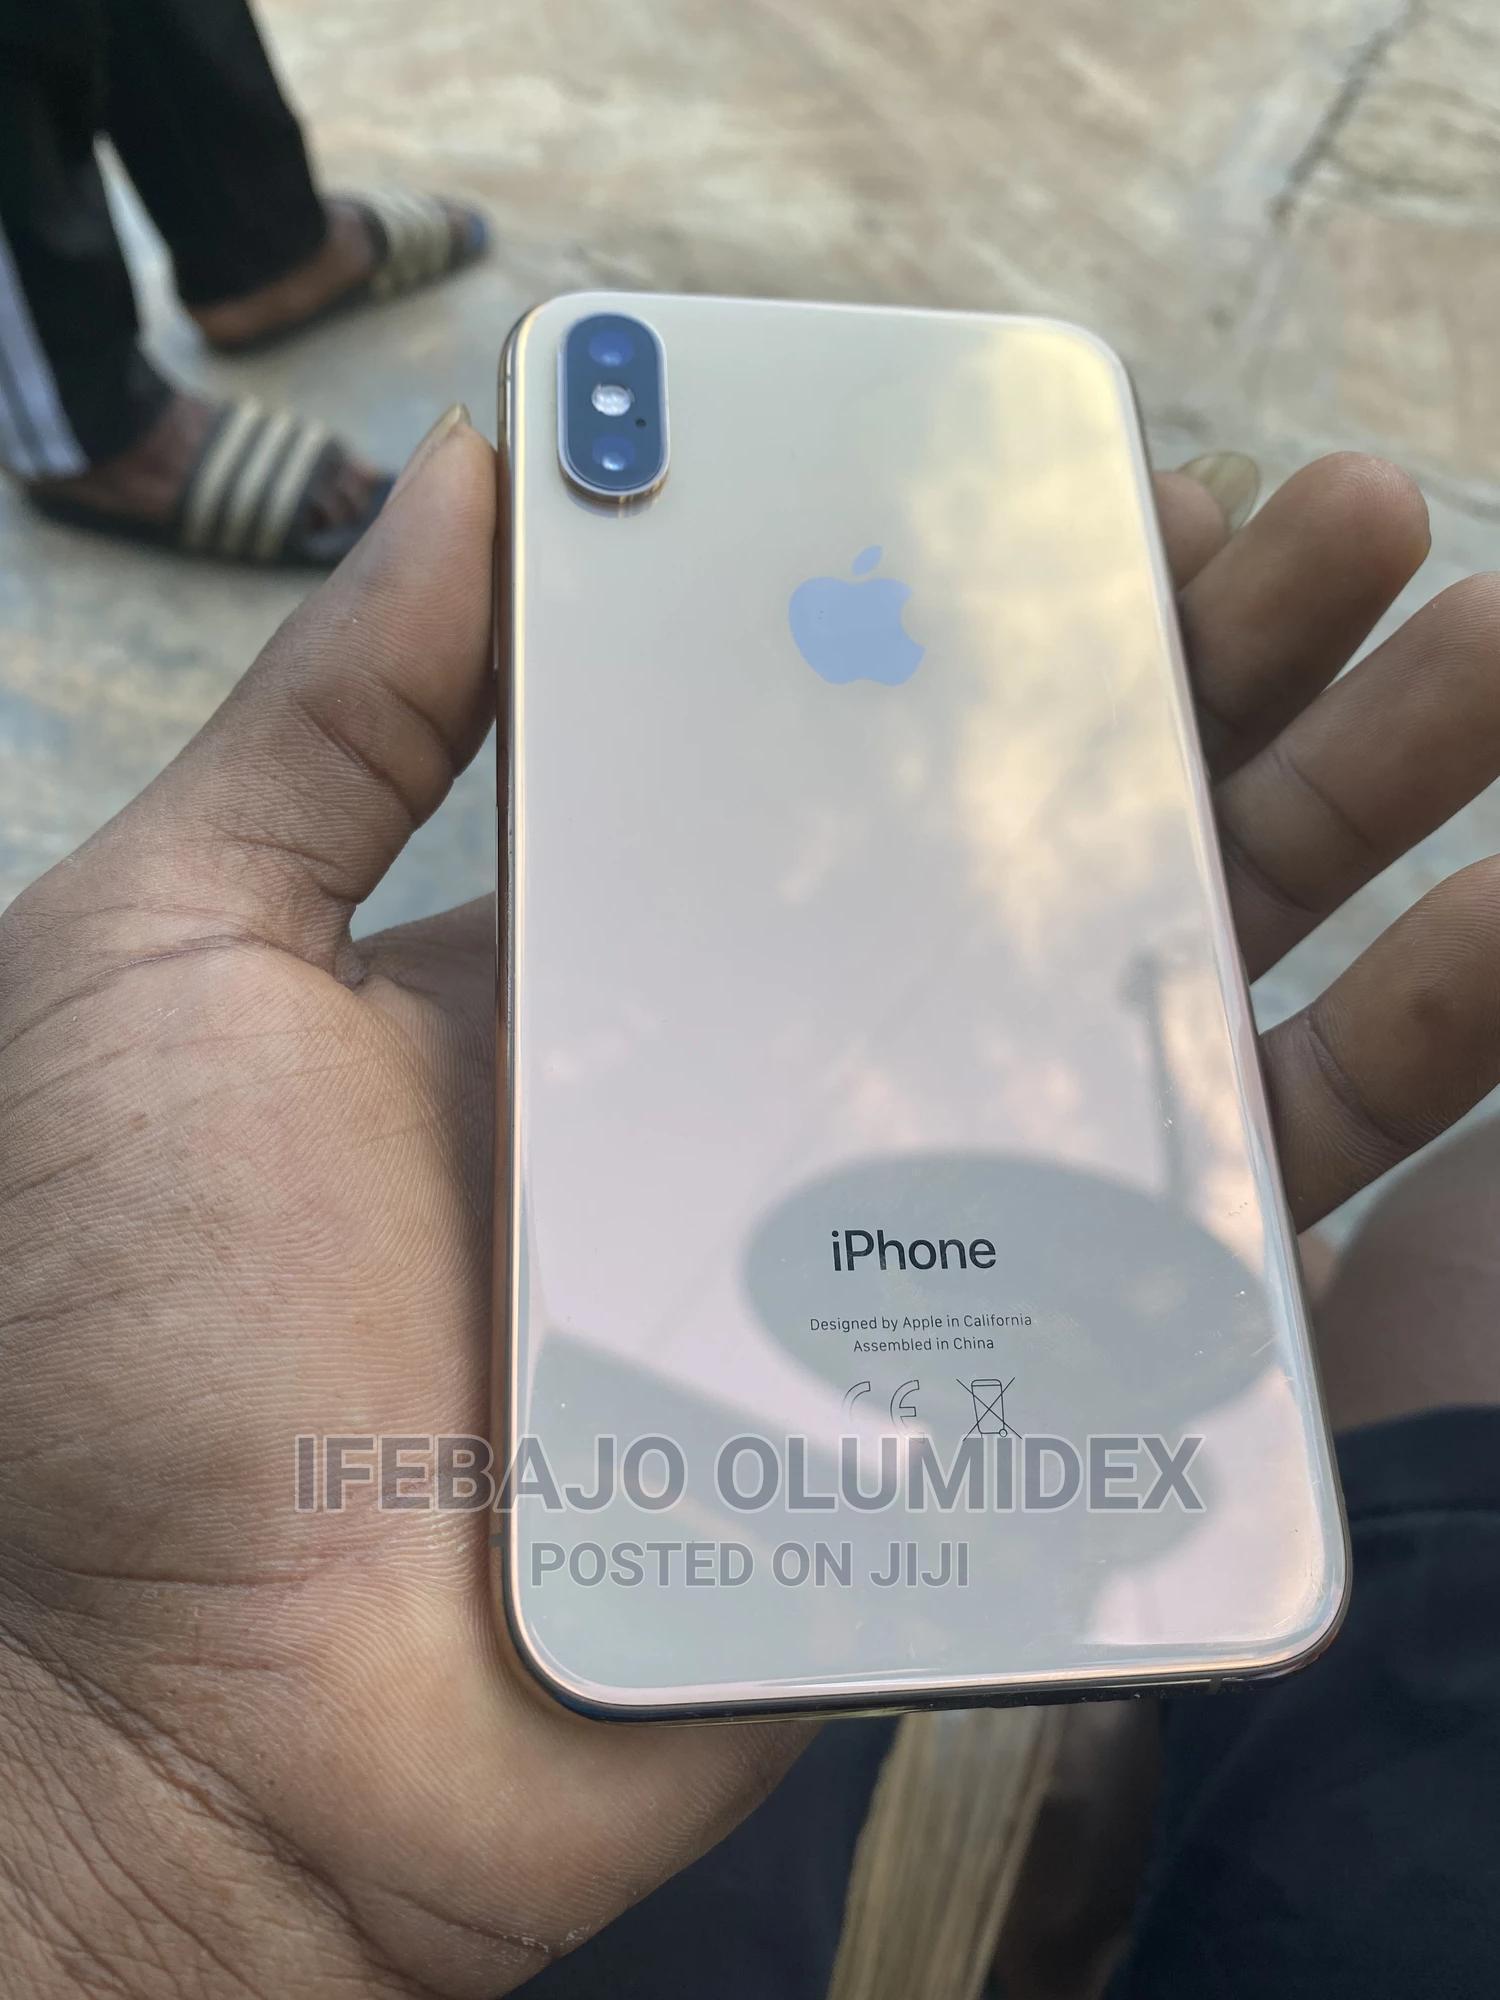 Apple iPhone XS 64 GB Gold | Mobile Phones for sale in Ijebu Ode, Ogun State, Nigeria